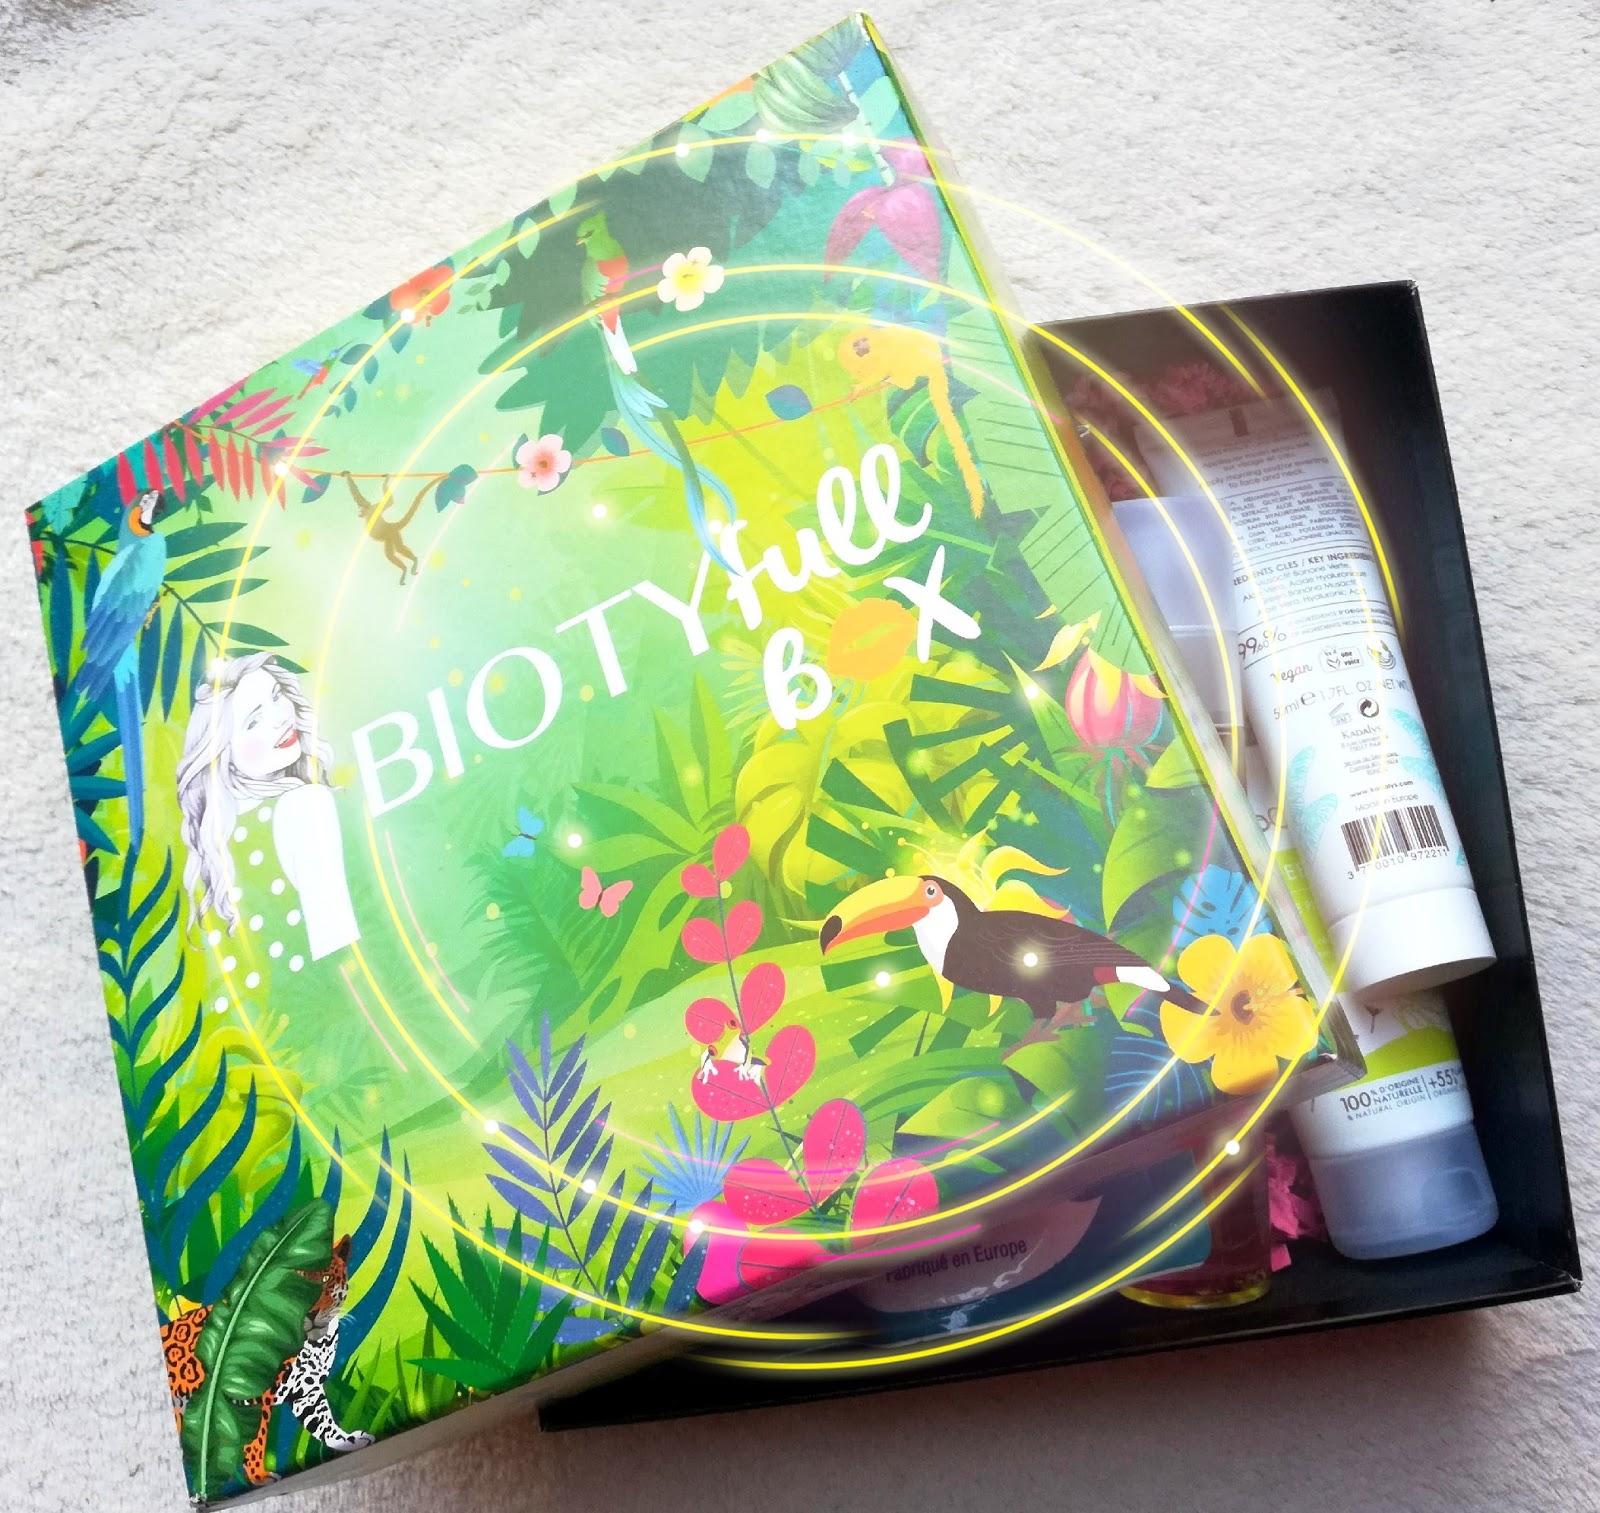 BIOTYFULL BOX Août 2019 : Routine réparatrice après soleil!